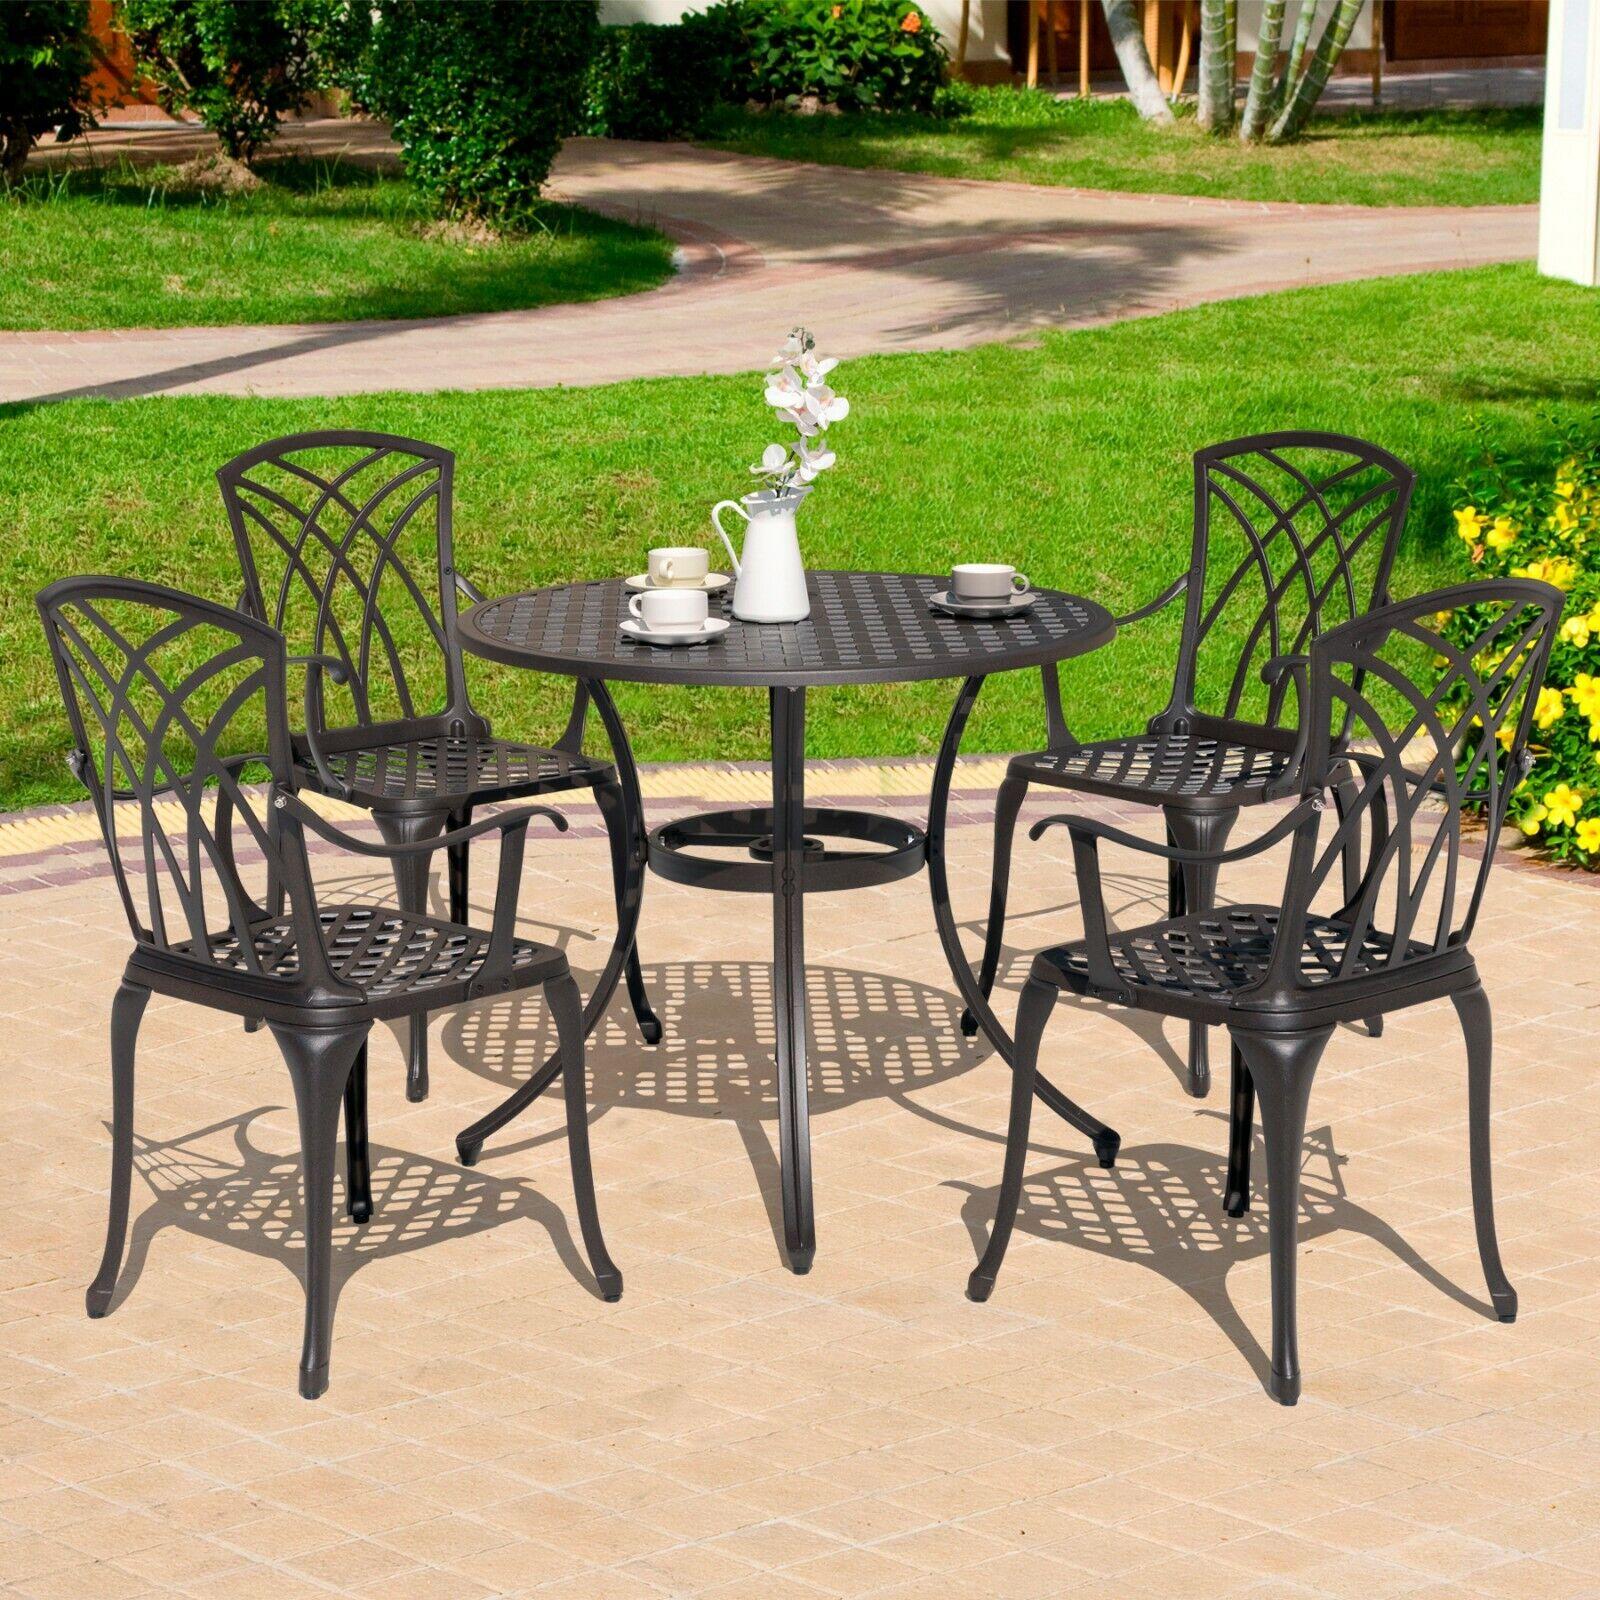 Garden Furniture - Nuu Garden 5 Piece Outdoor Cast Aluminum Dining Set Patio Bistro Set Furniture